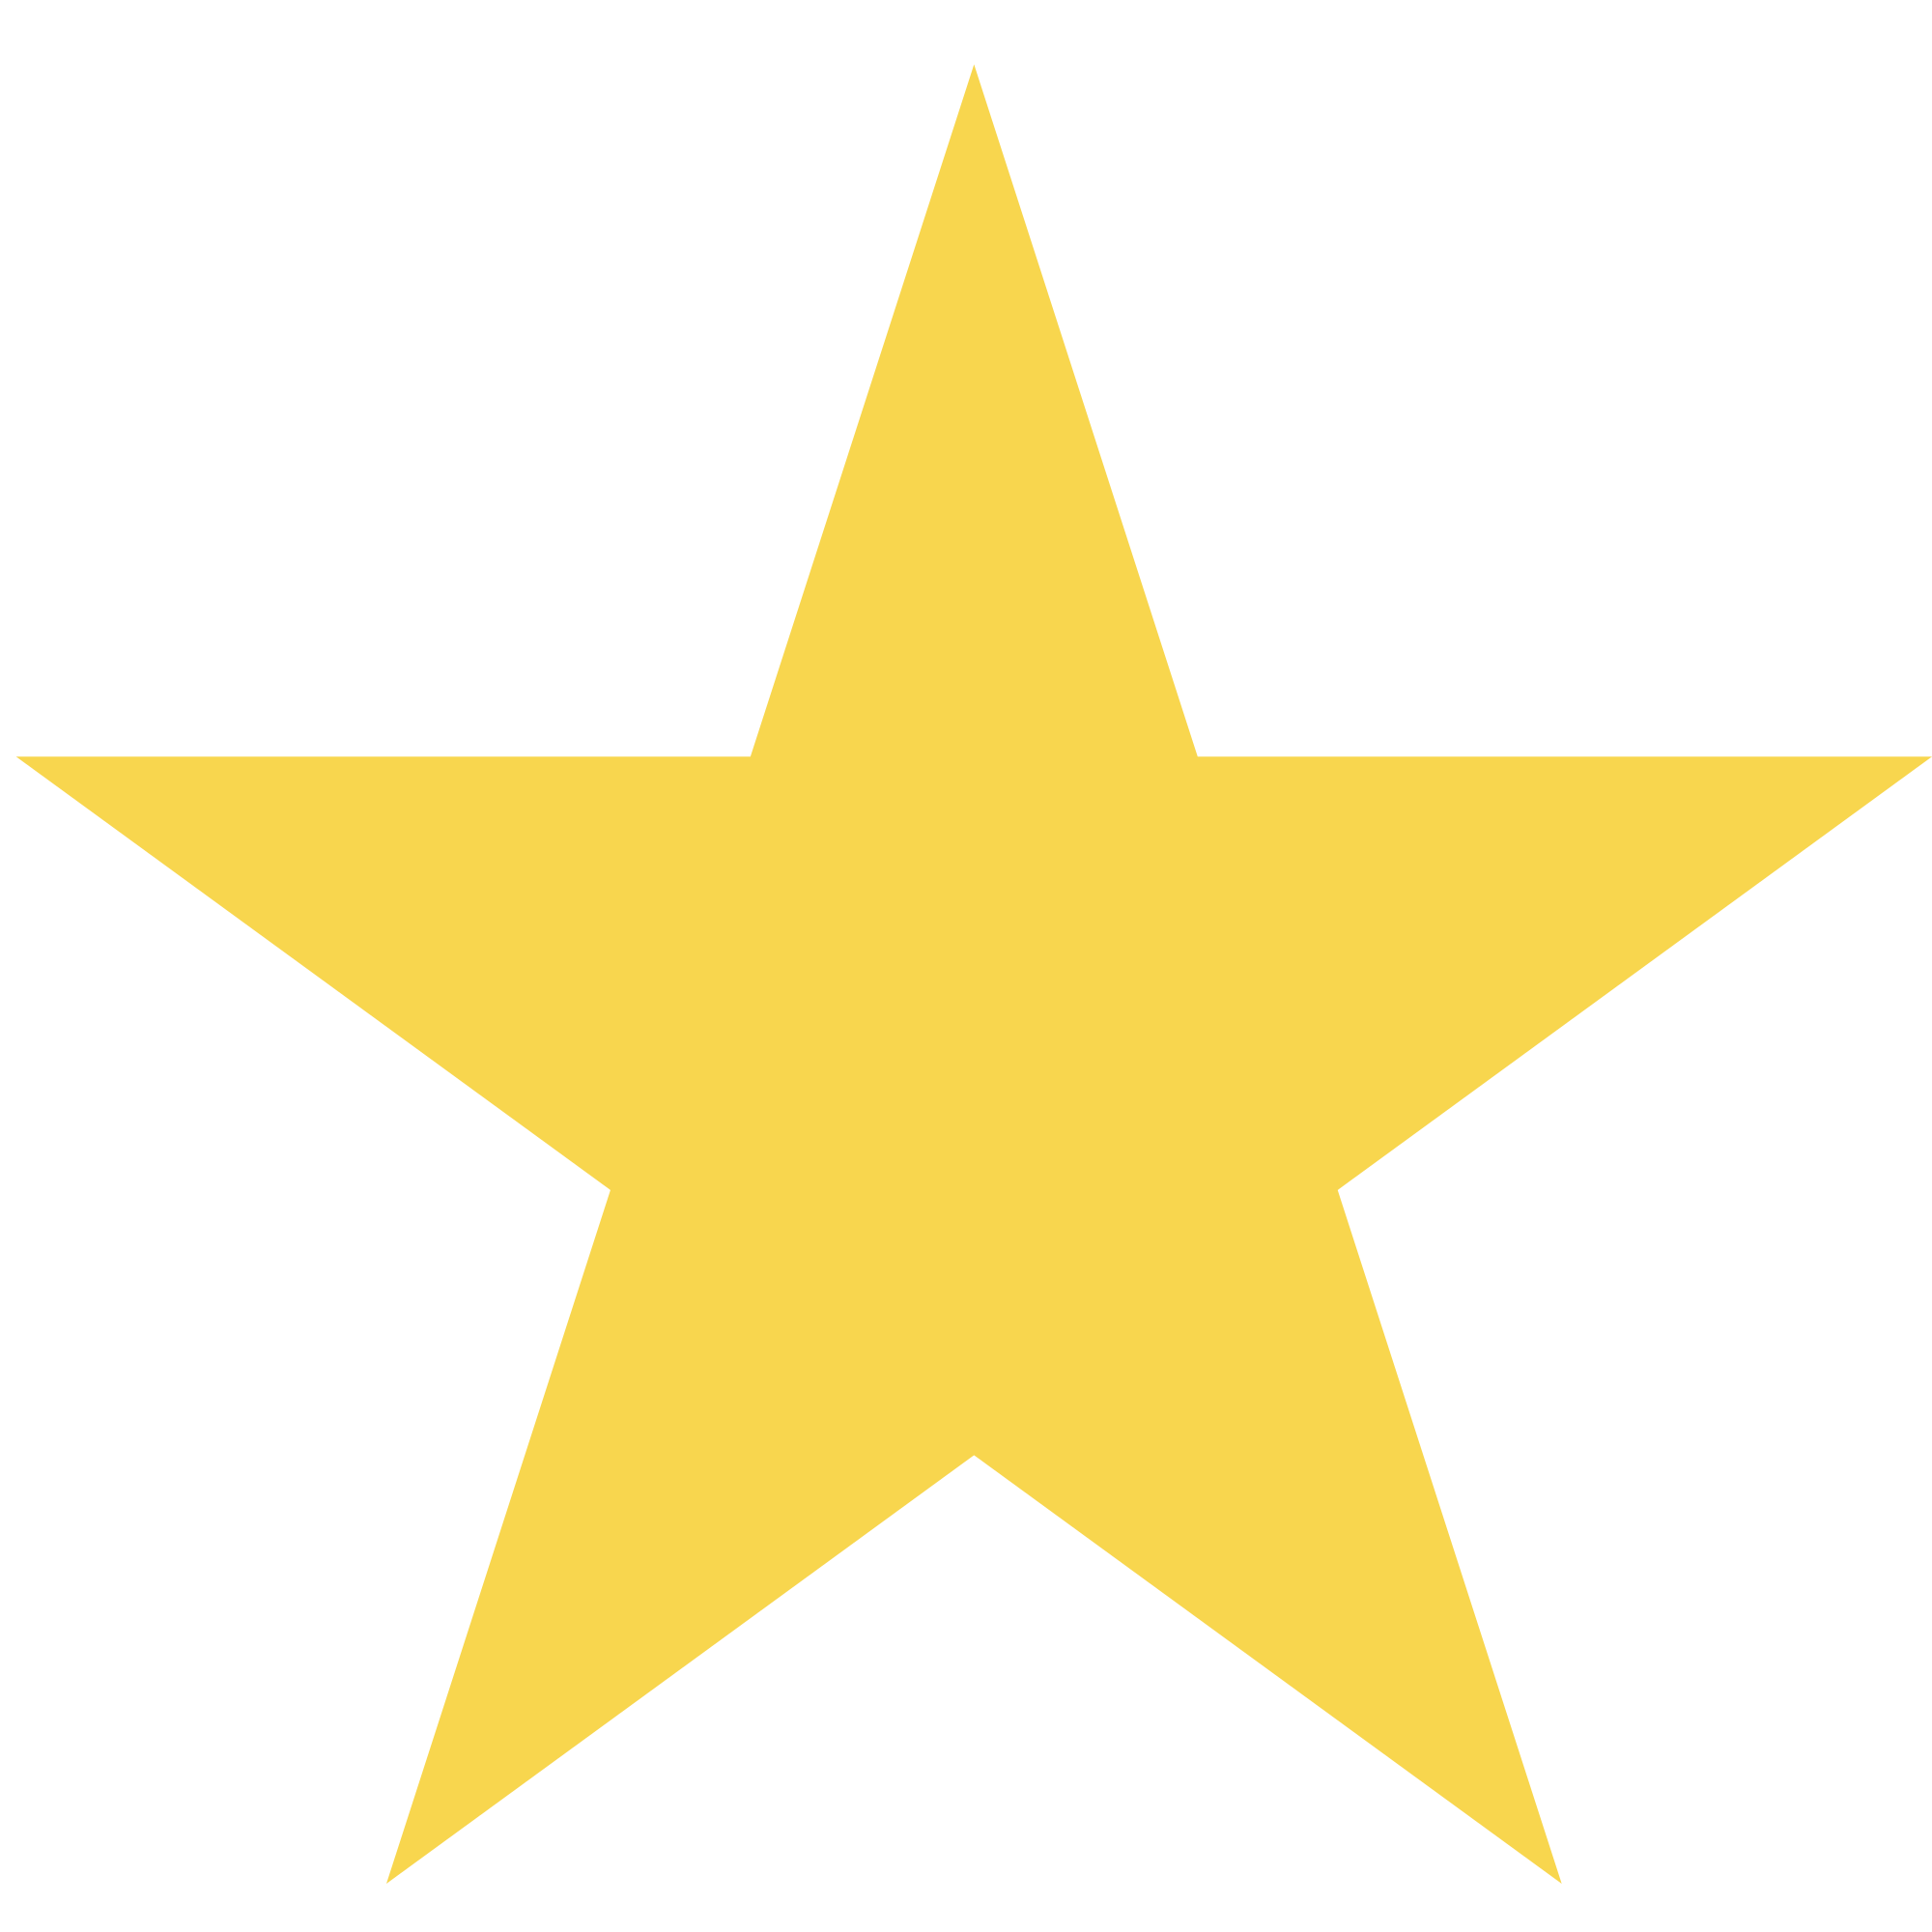 2000x2000 Filegold Star.svg